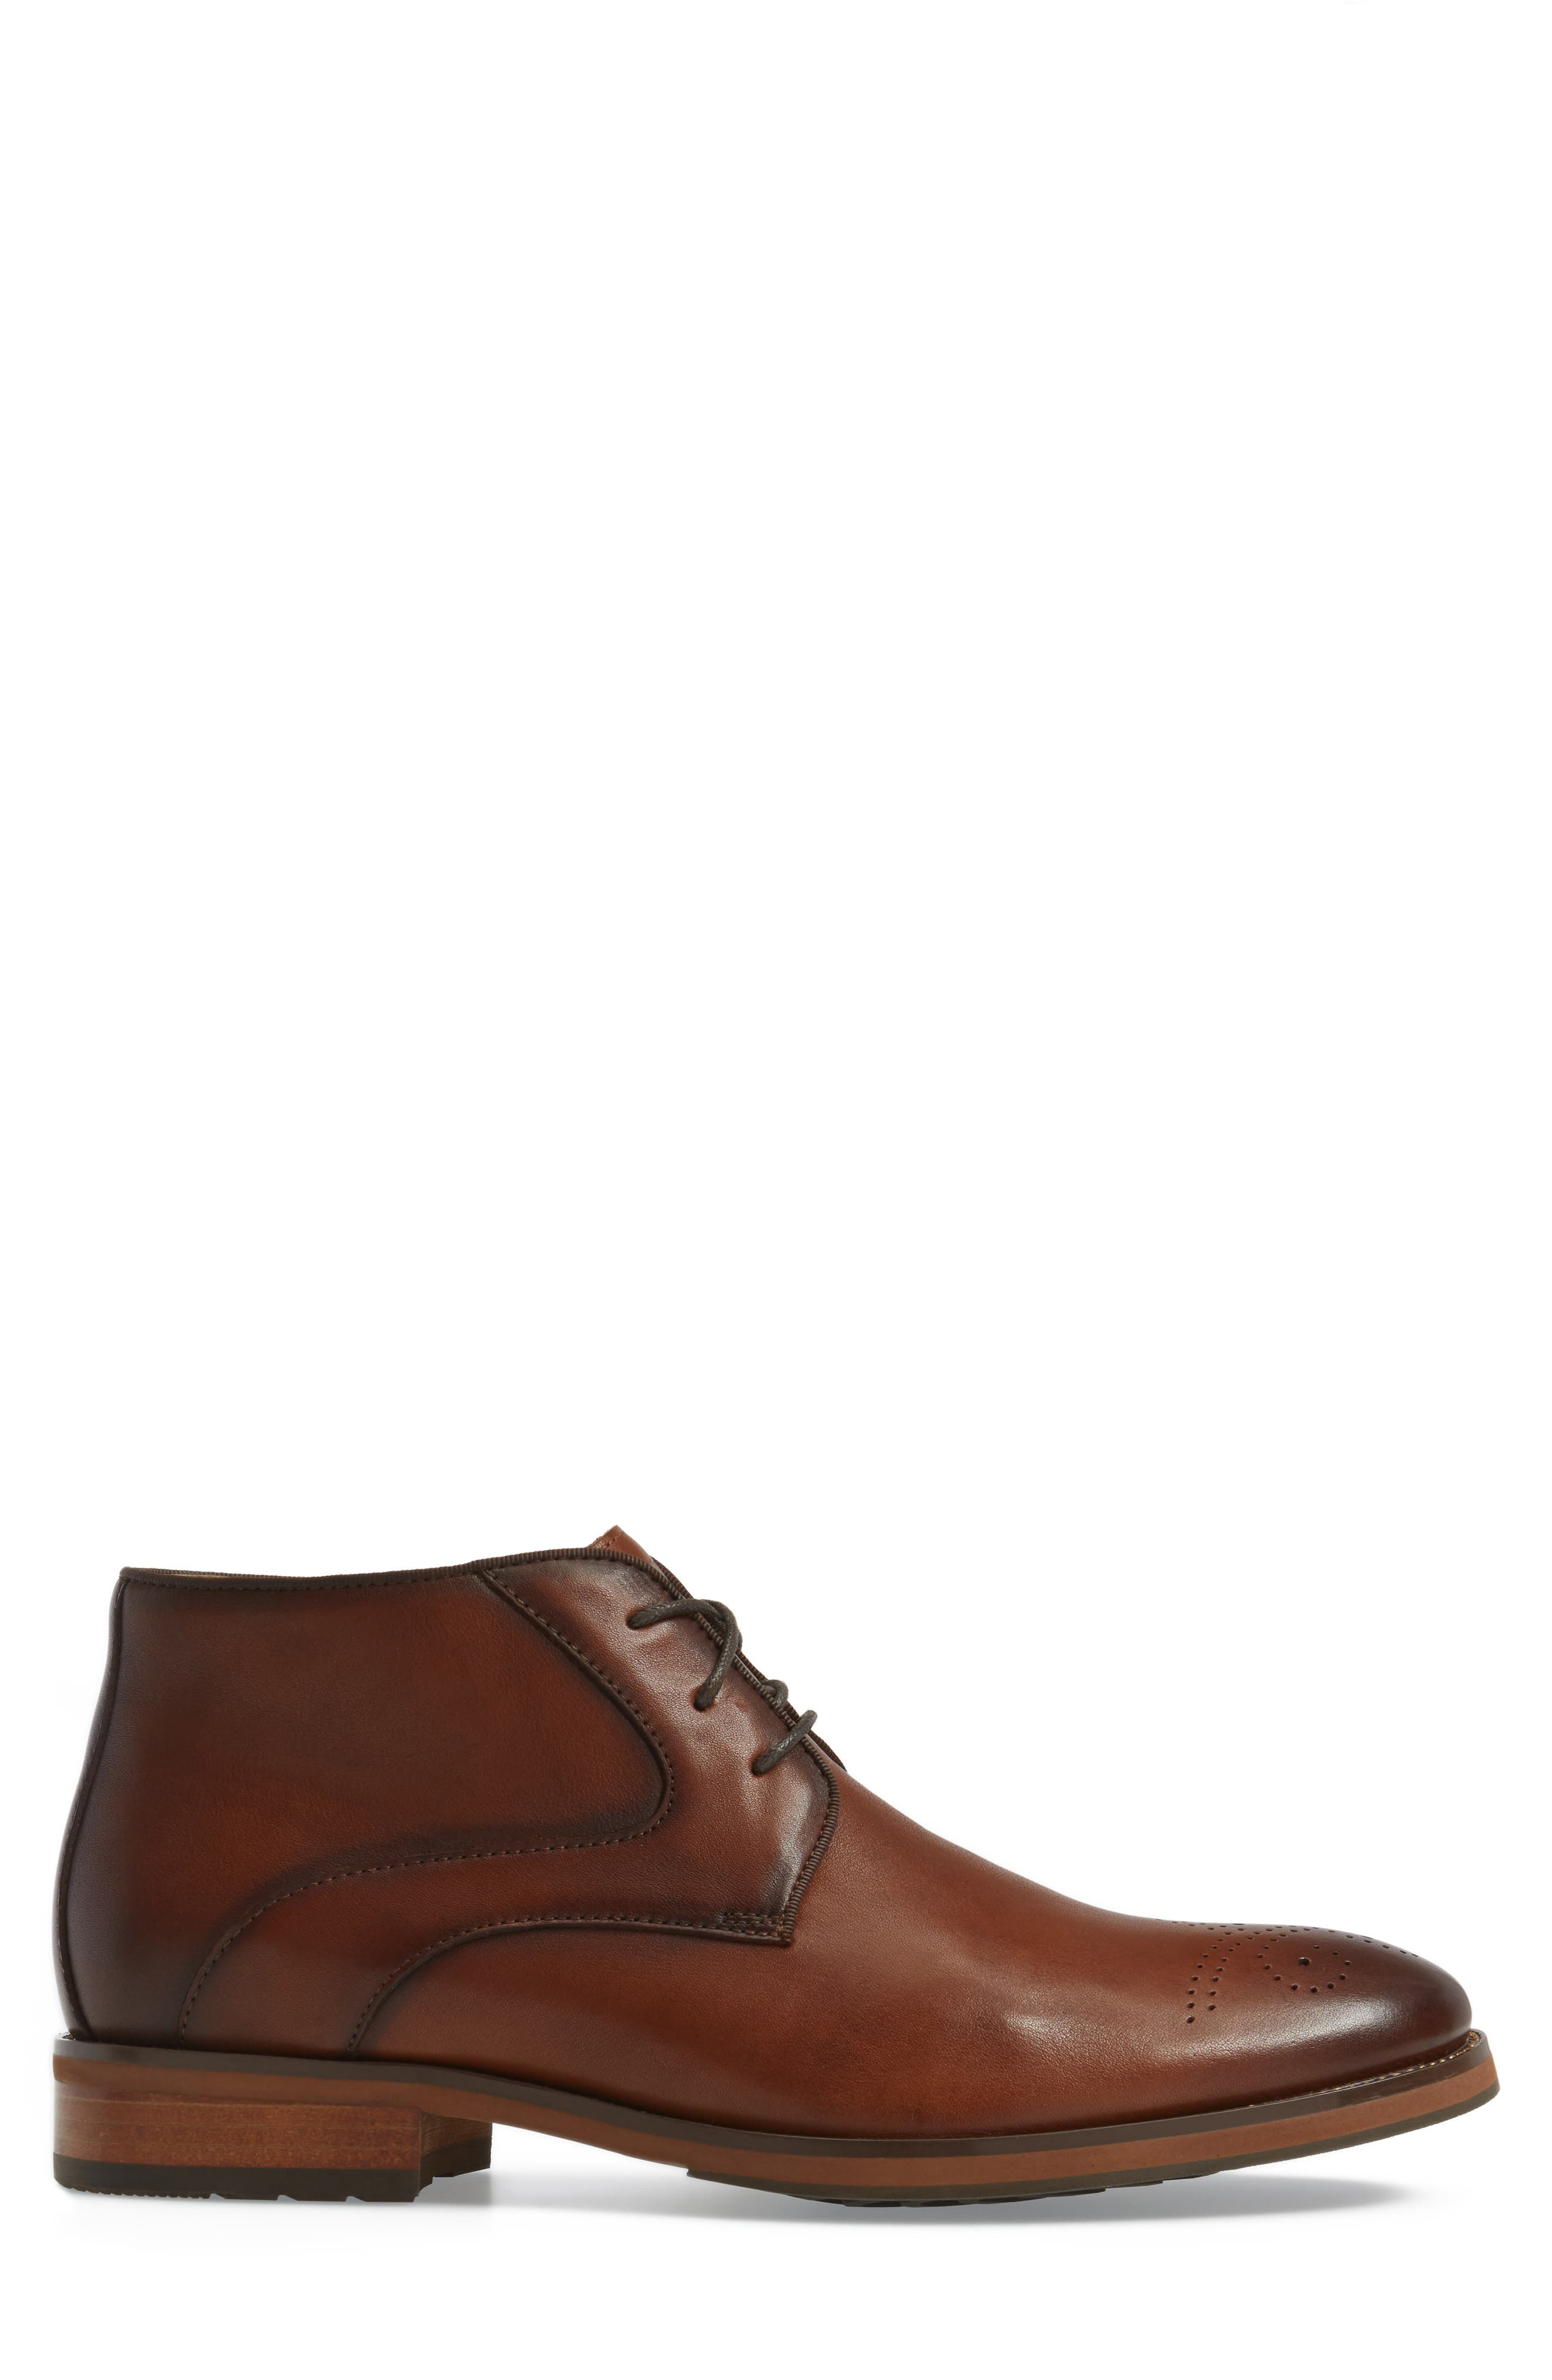 Blaze Chukka Boot,                             Alternate thumbnail 3, color,                             Cognac Leather